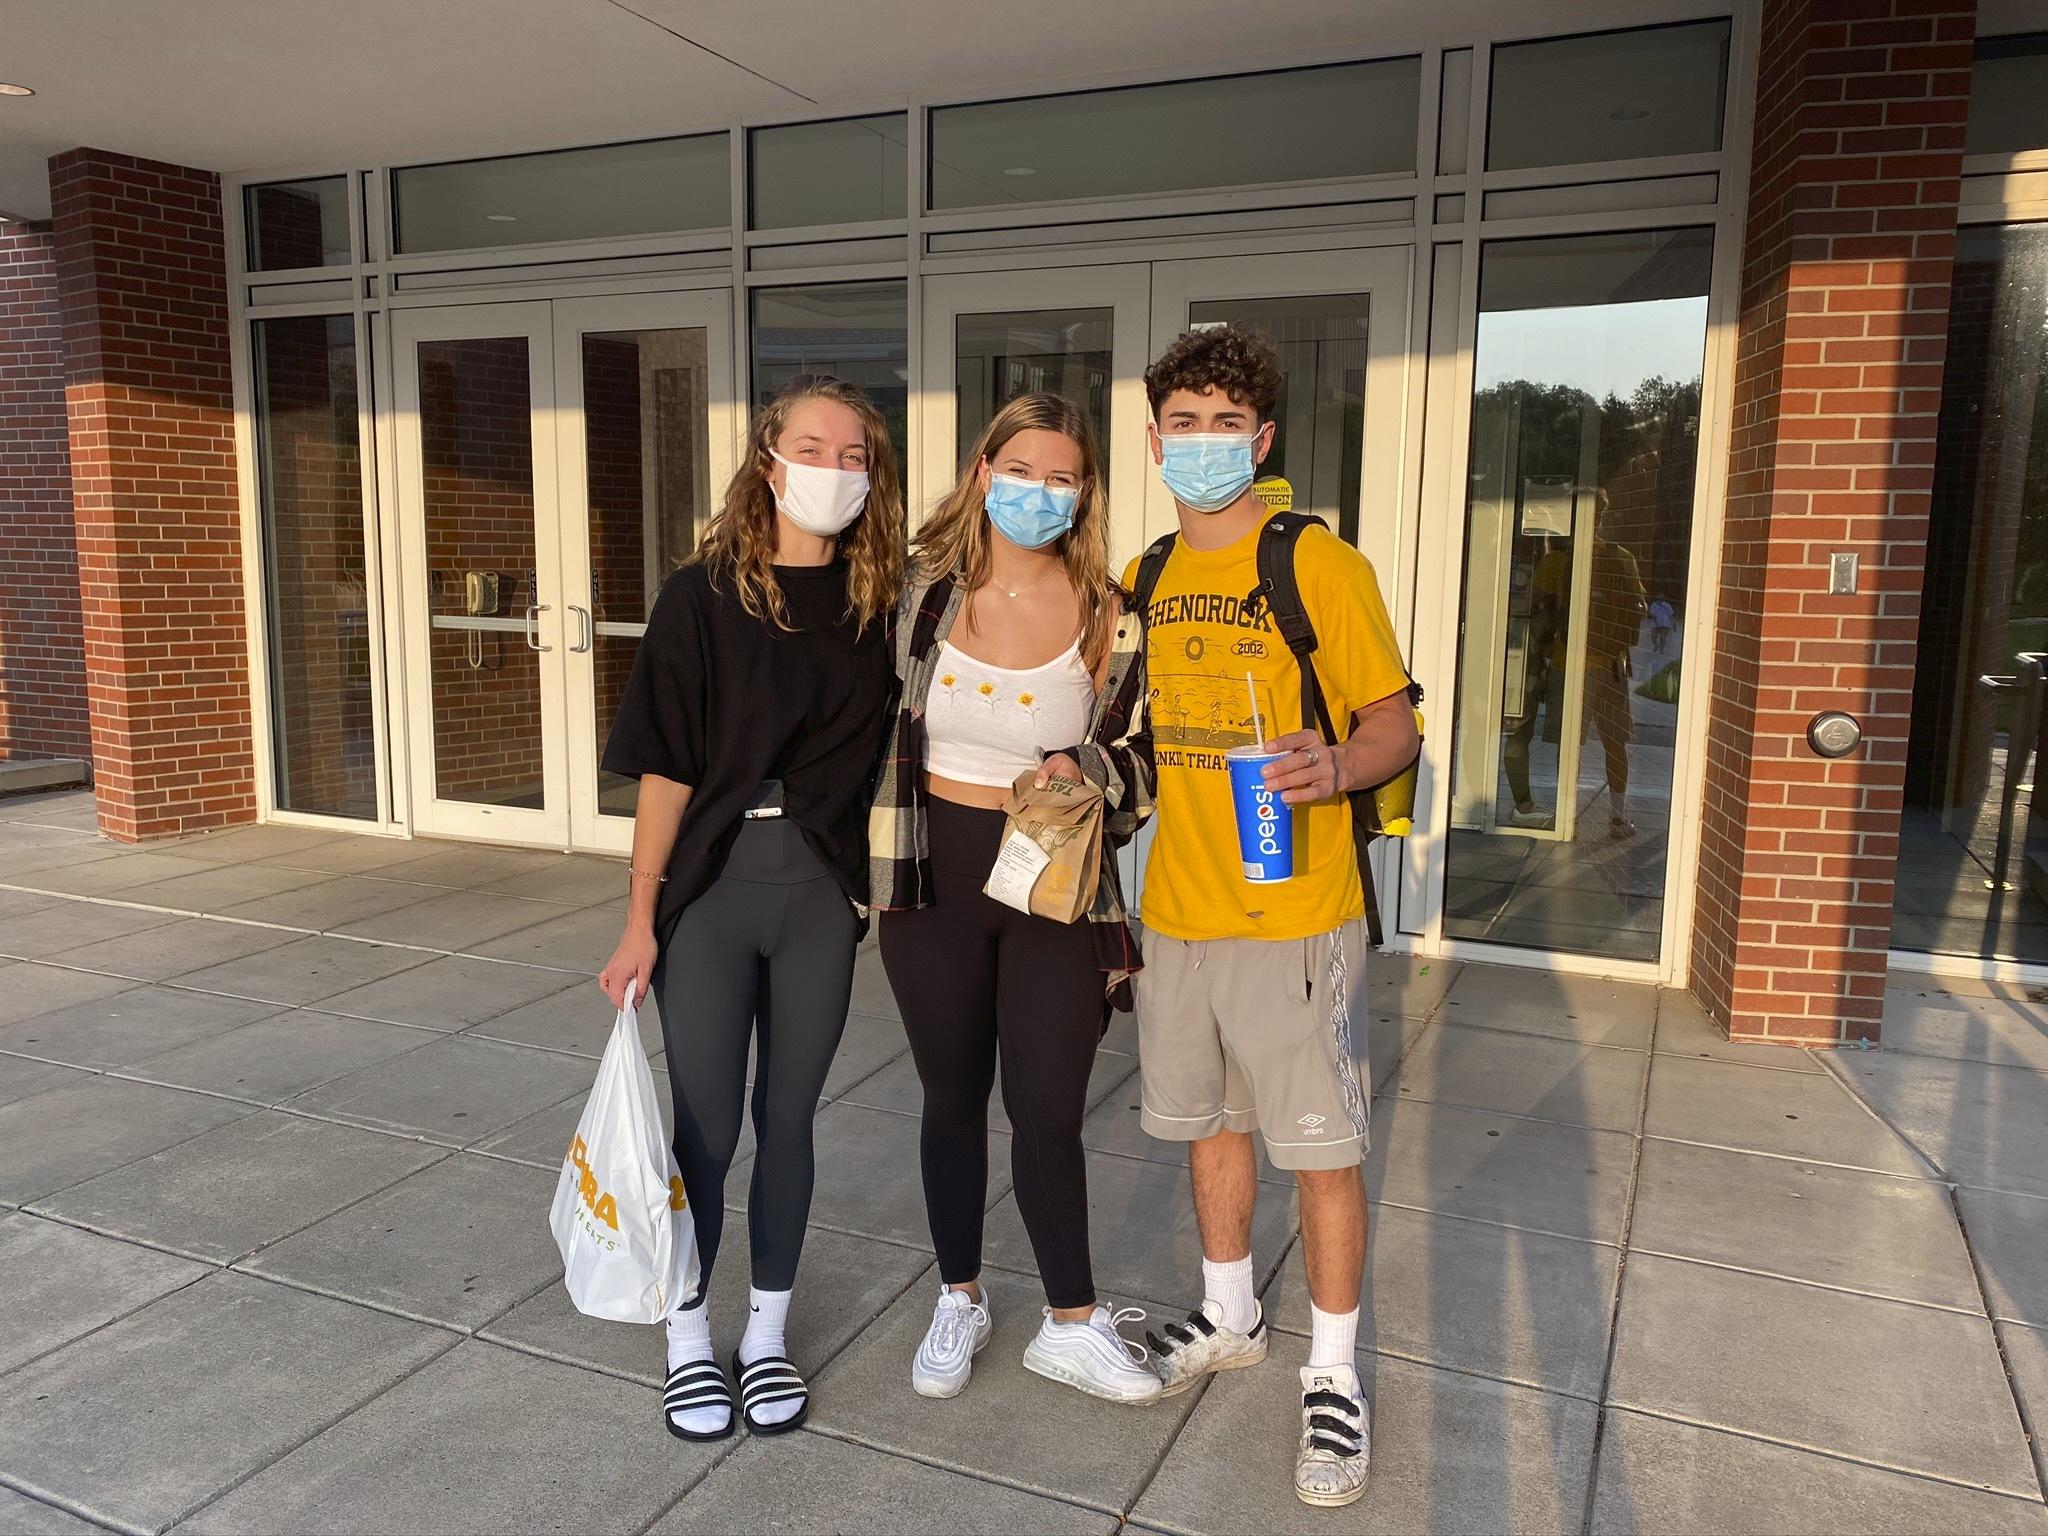 Masked Mayhem dining 1 - Masked Mayhem: UNL students navigate the COVID-19 pandemic